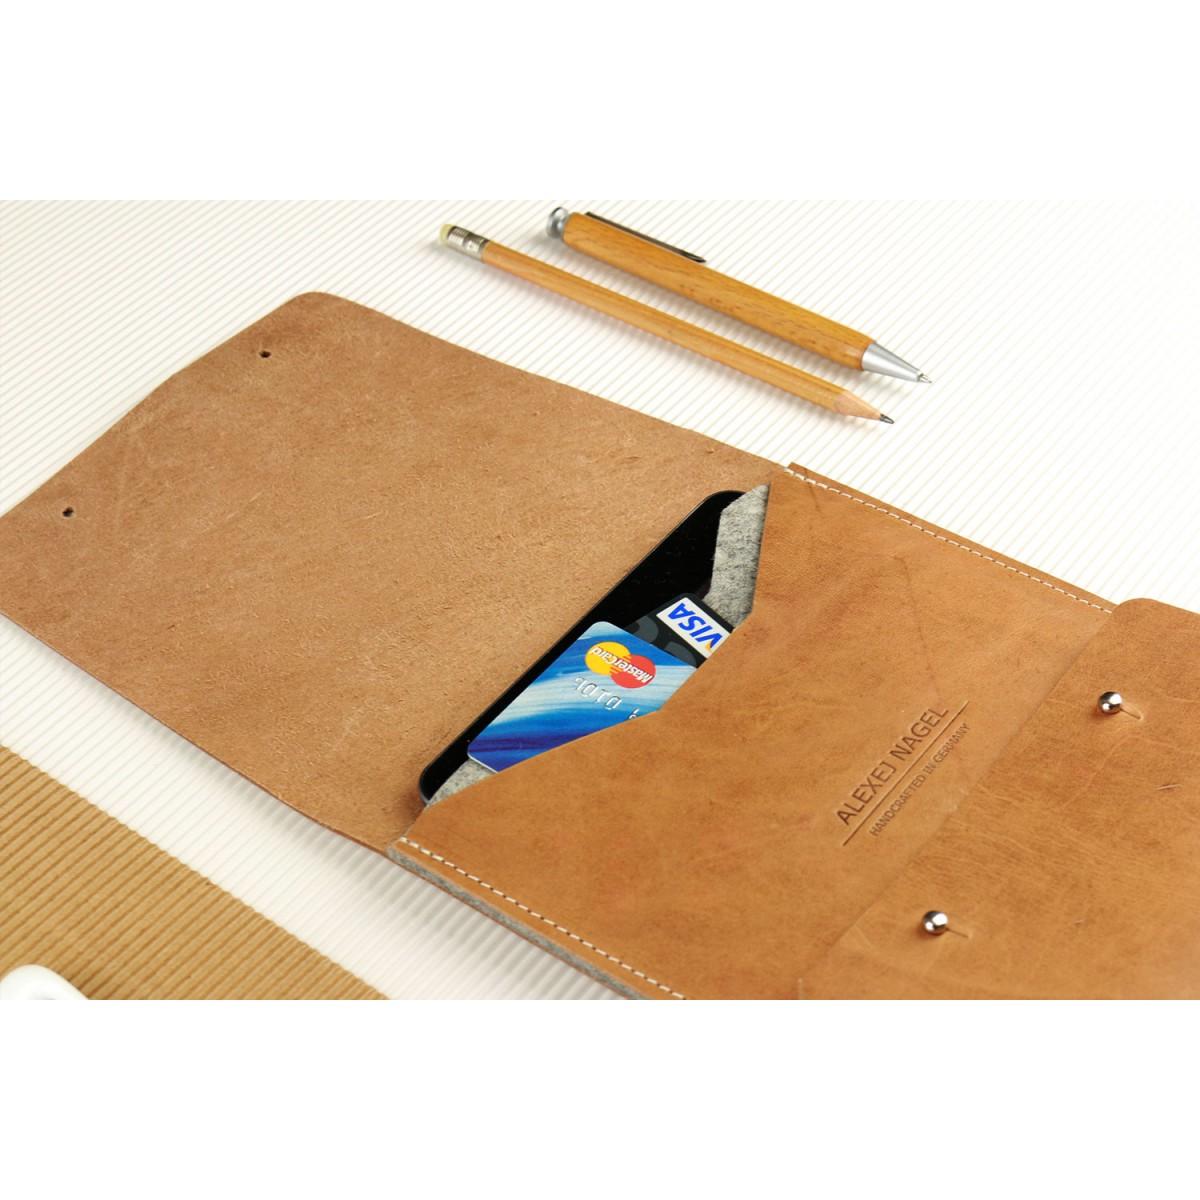 Alexej Nagel Elegante Hülle für iPad Air / Air 2 aus Vintage Leder [V]